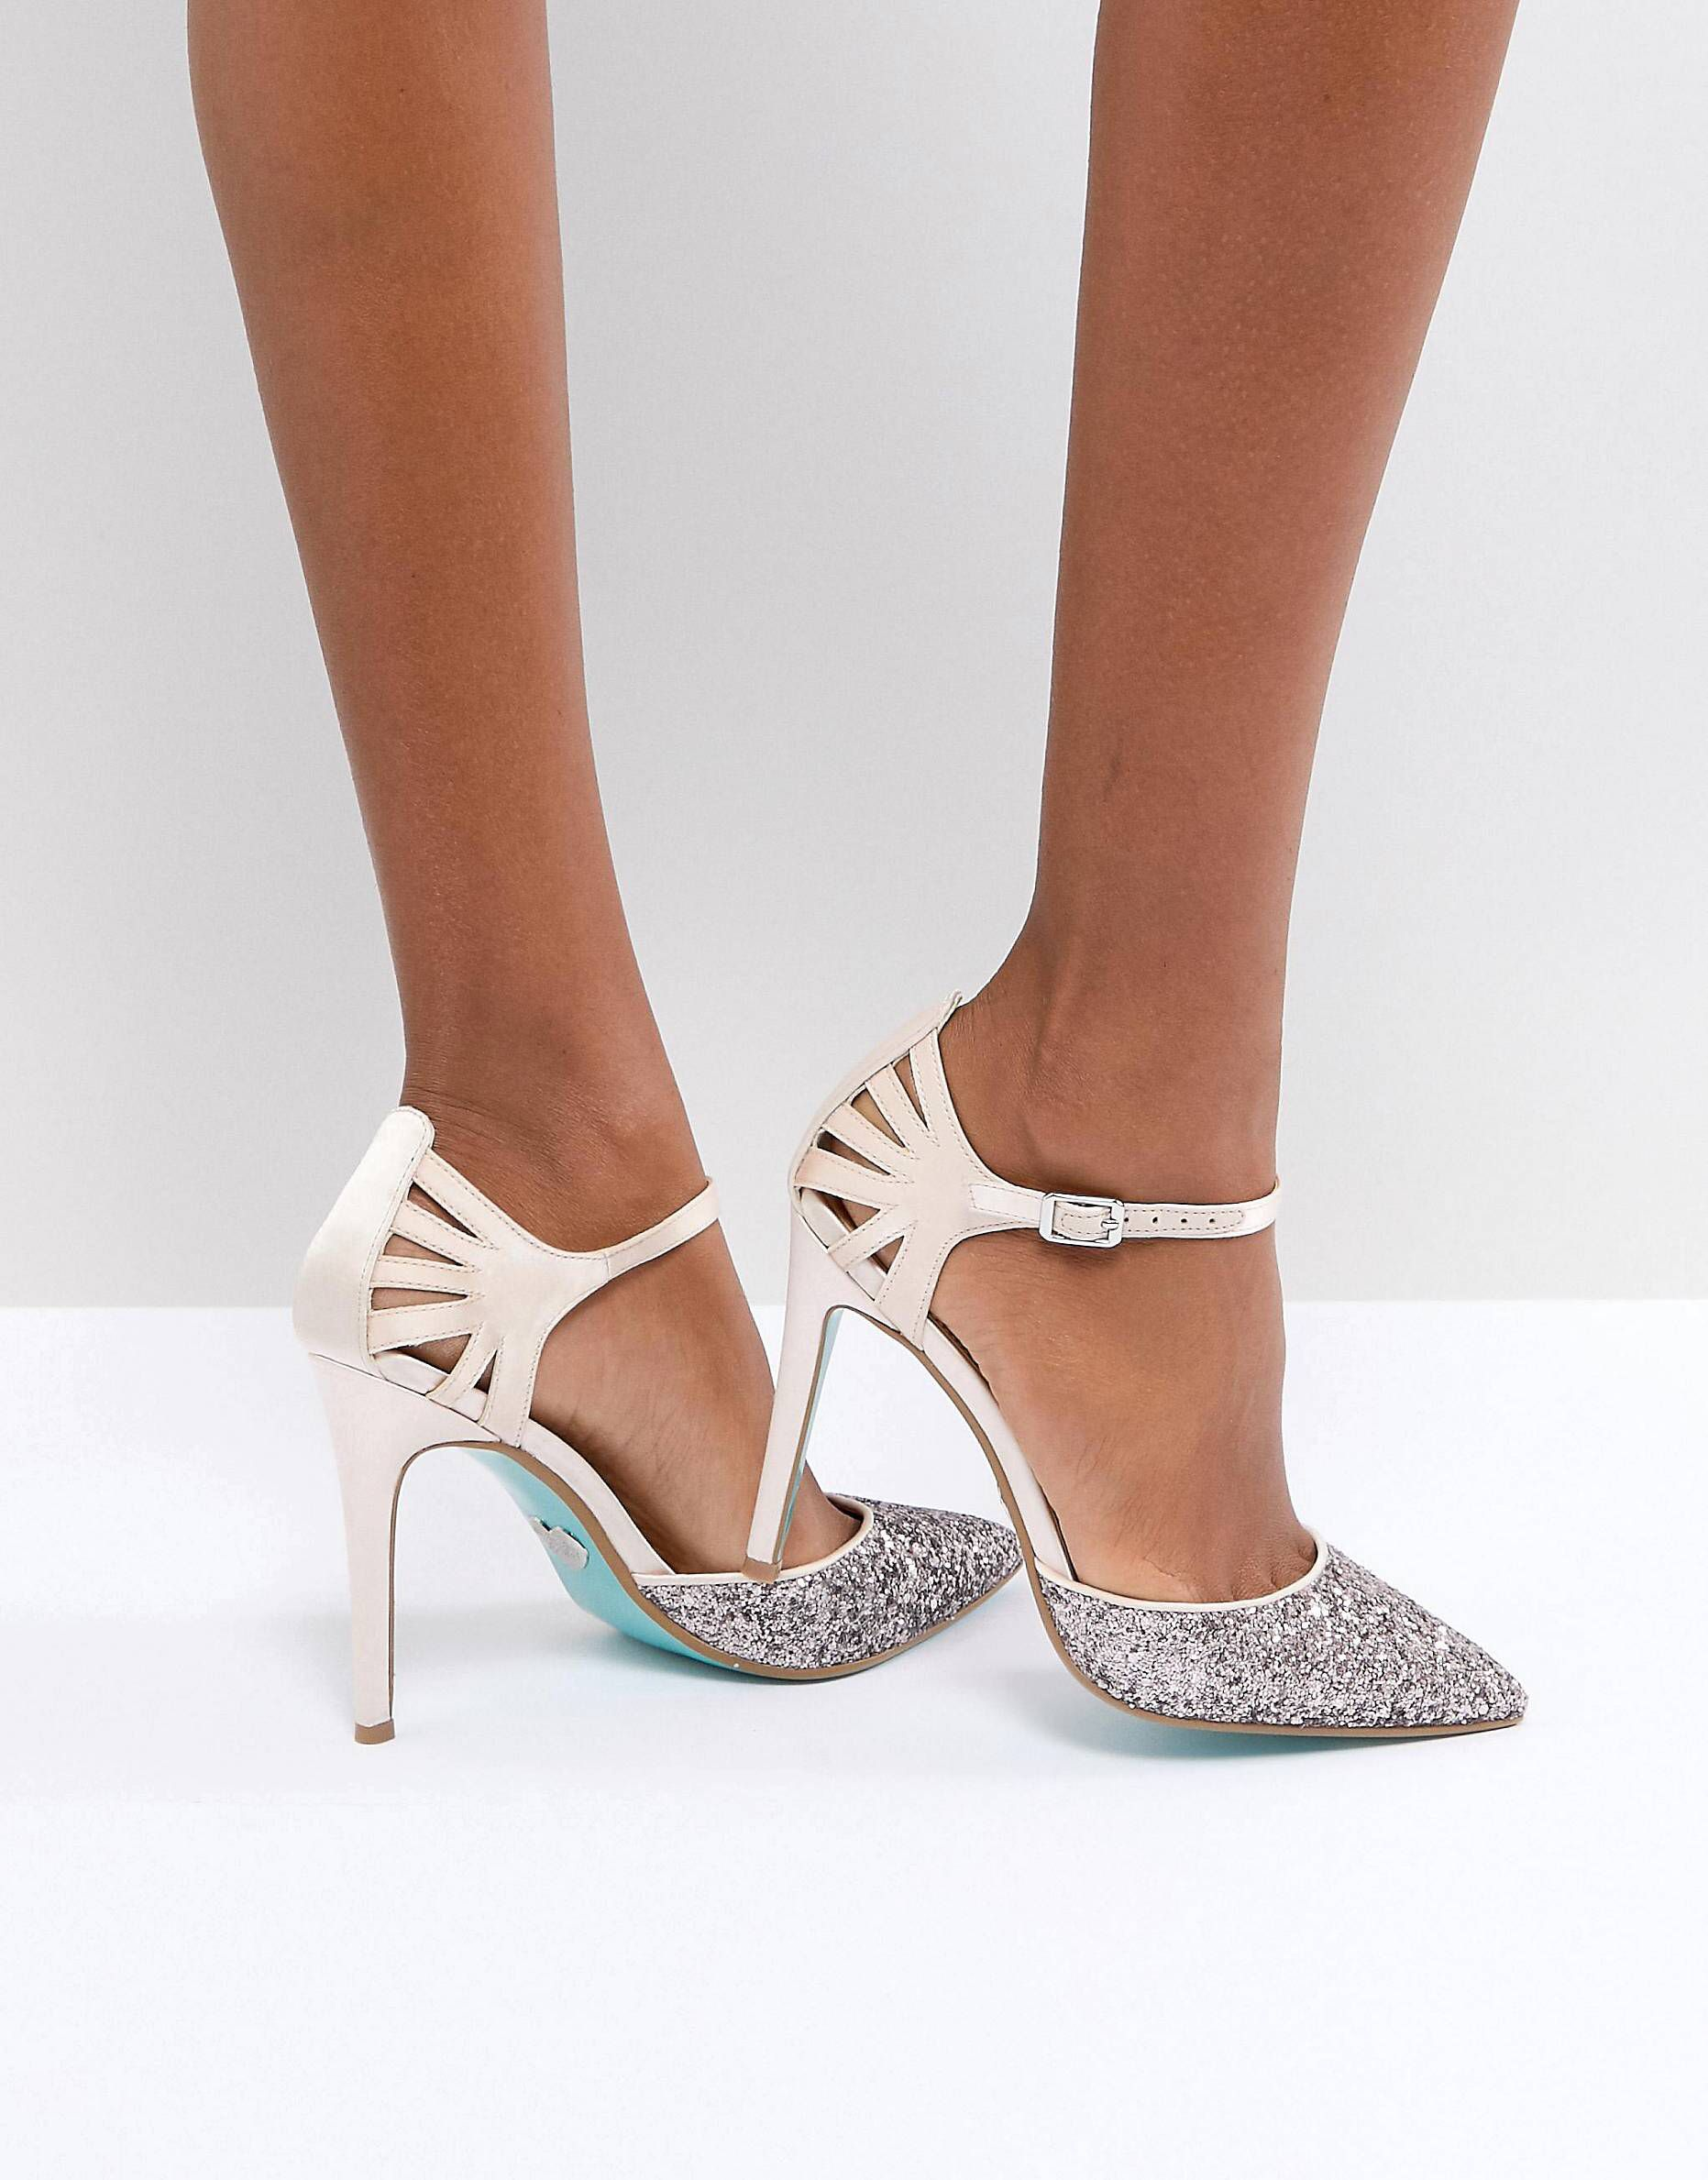 d2bb2ecdda7 Blue By Betsy Johnson Blush Avery Heeled Wedding Shoes in 2019 ...